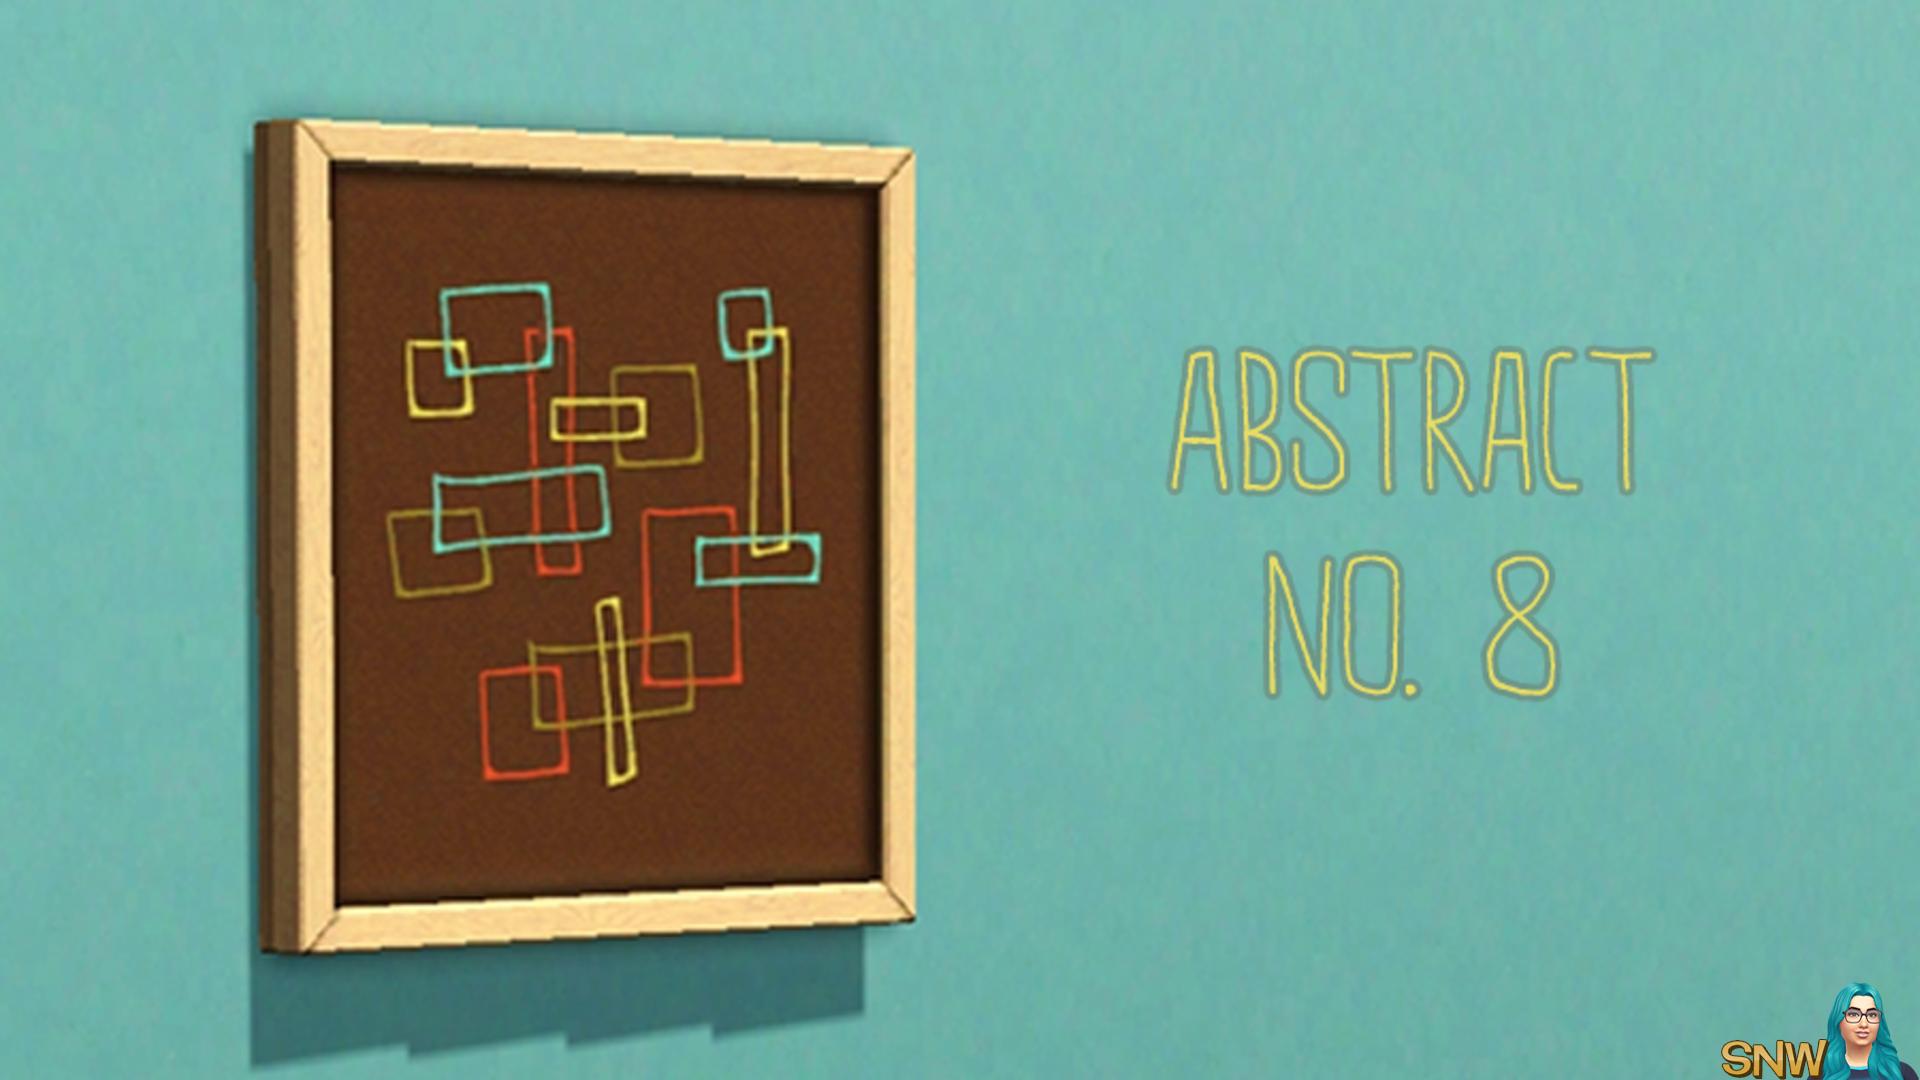 Abstract No. 8 painting